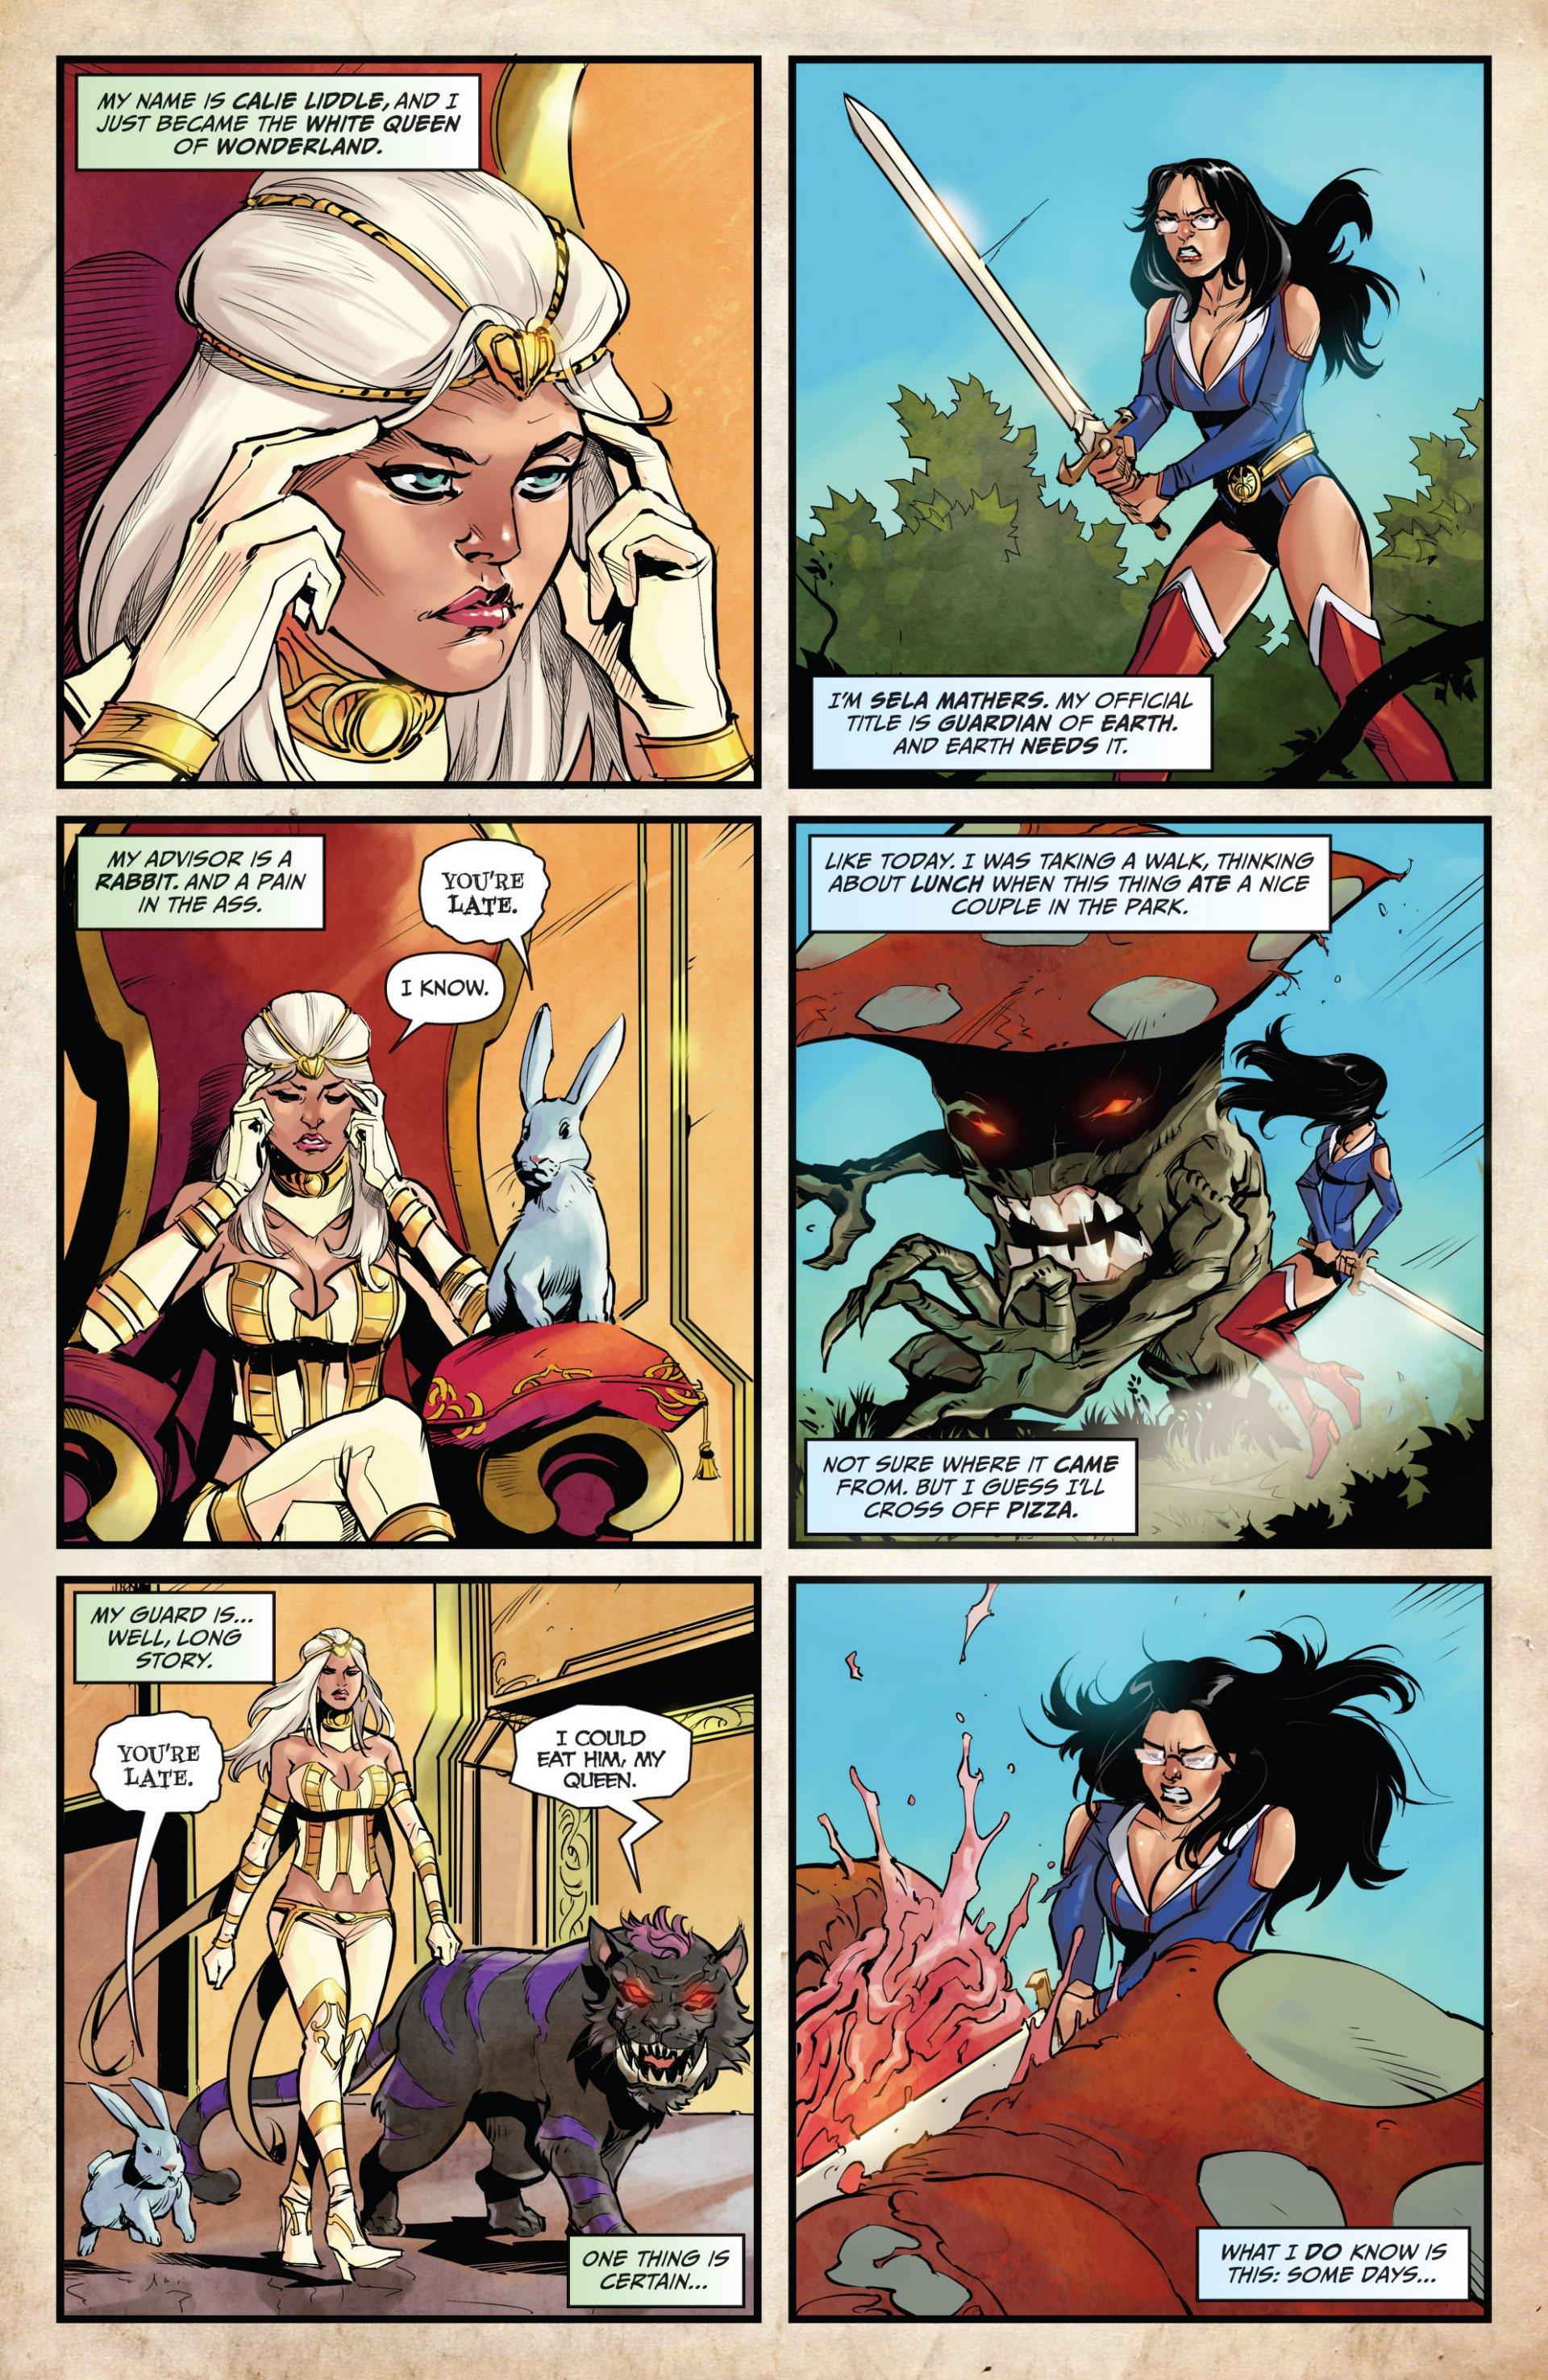 Read online Grimm Fairy Tales vs. Wonderland comic -  Issue #1 - 4